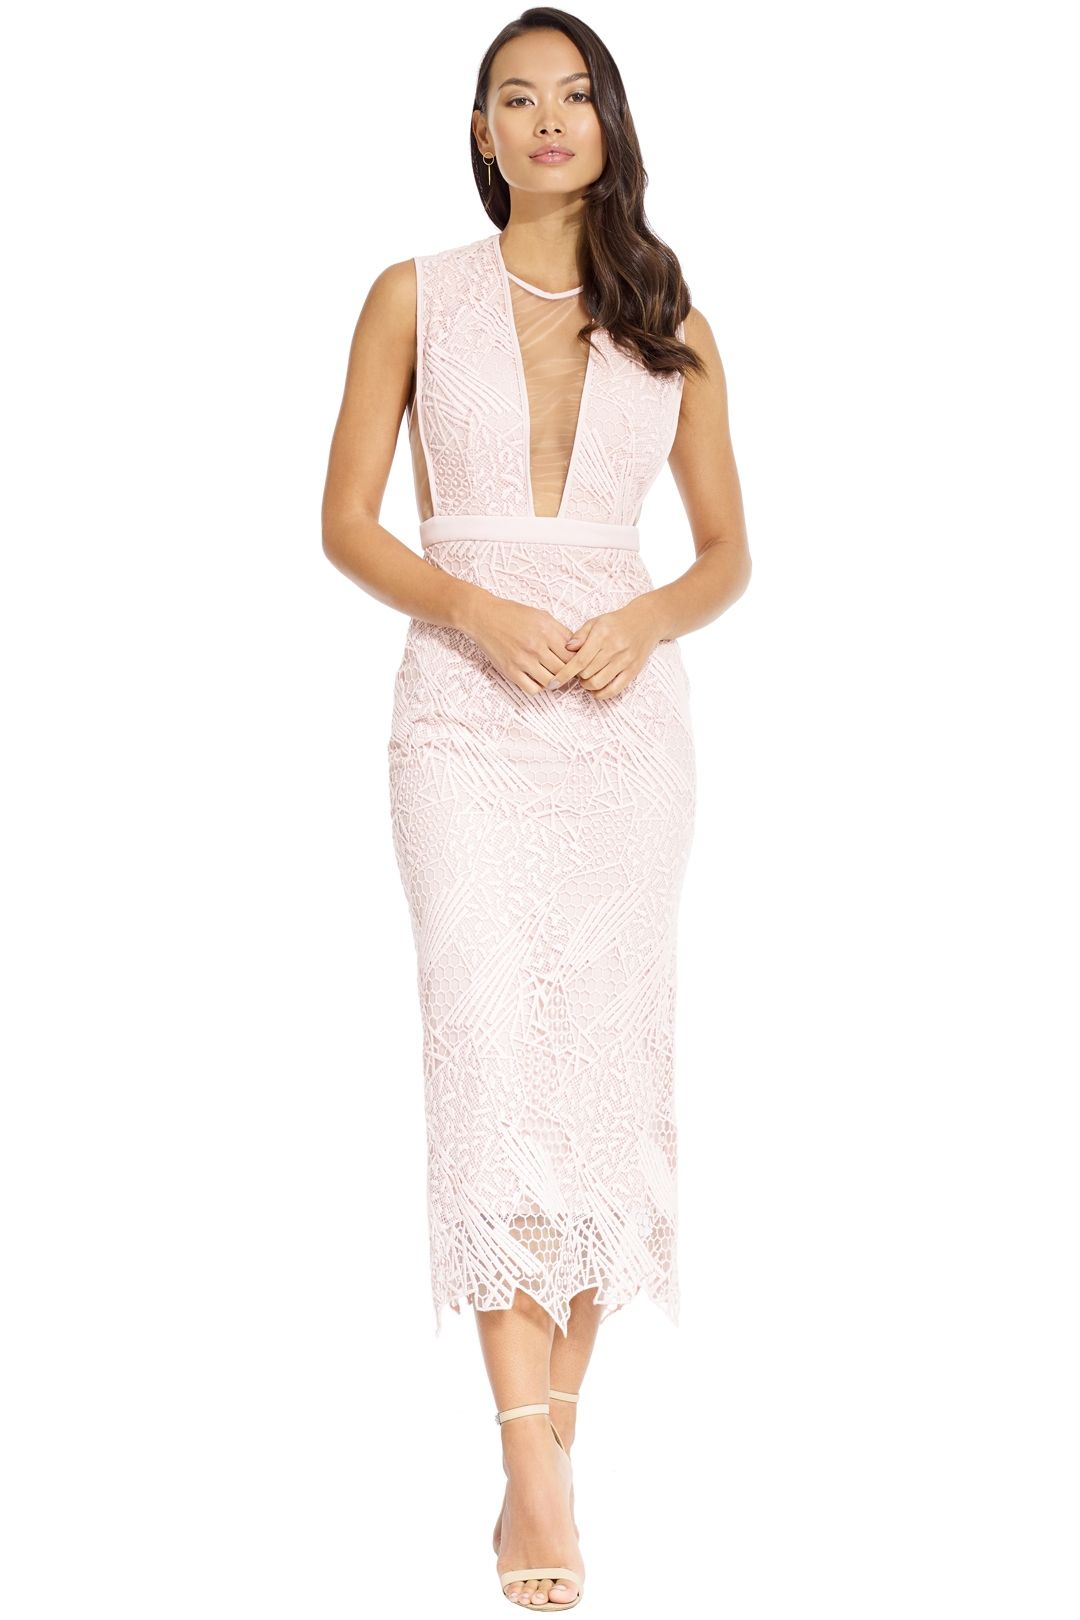 Manning Cartell - Gallery Views Sheath Dress - Blush - Front